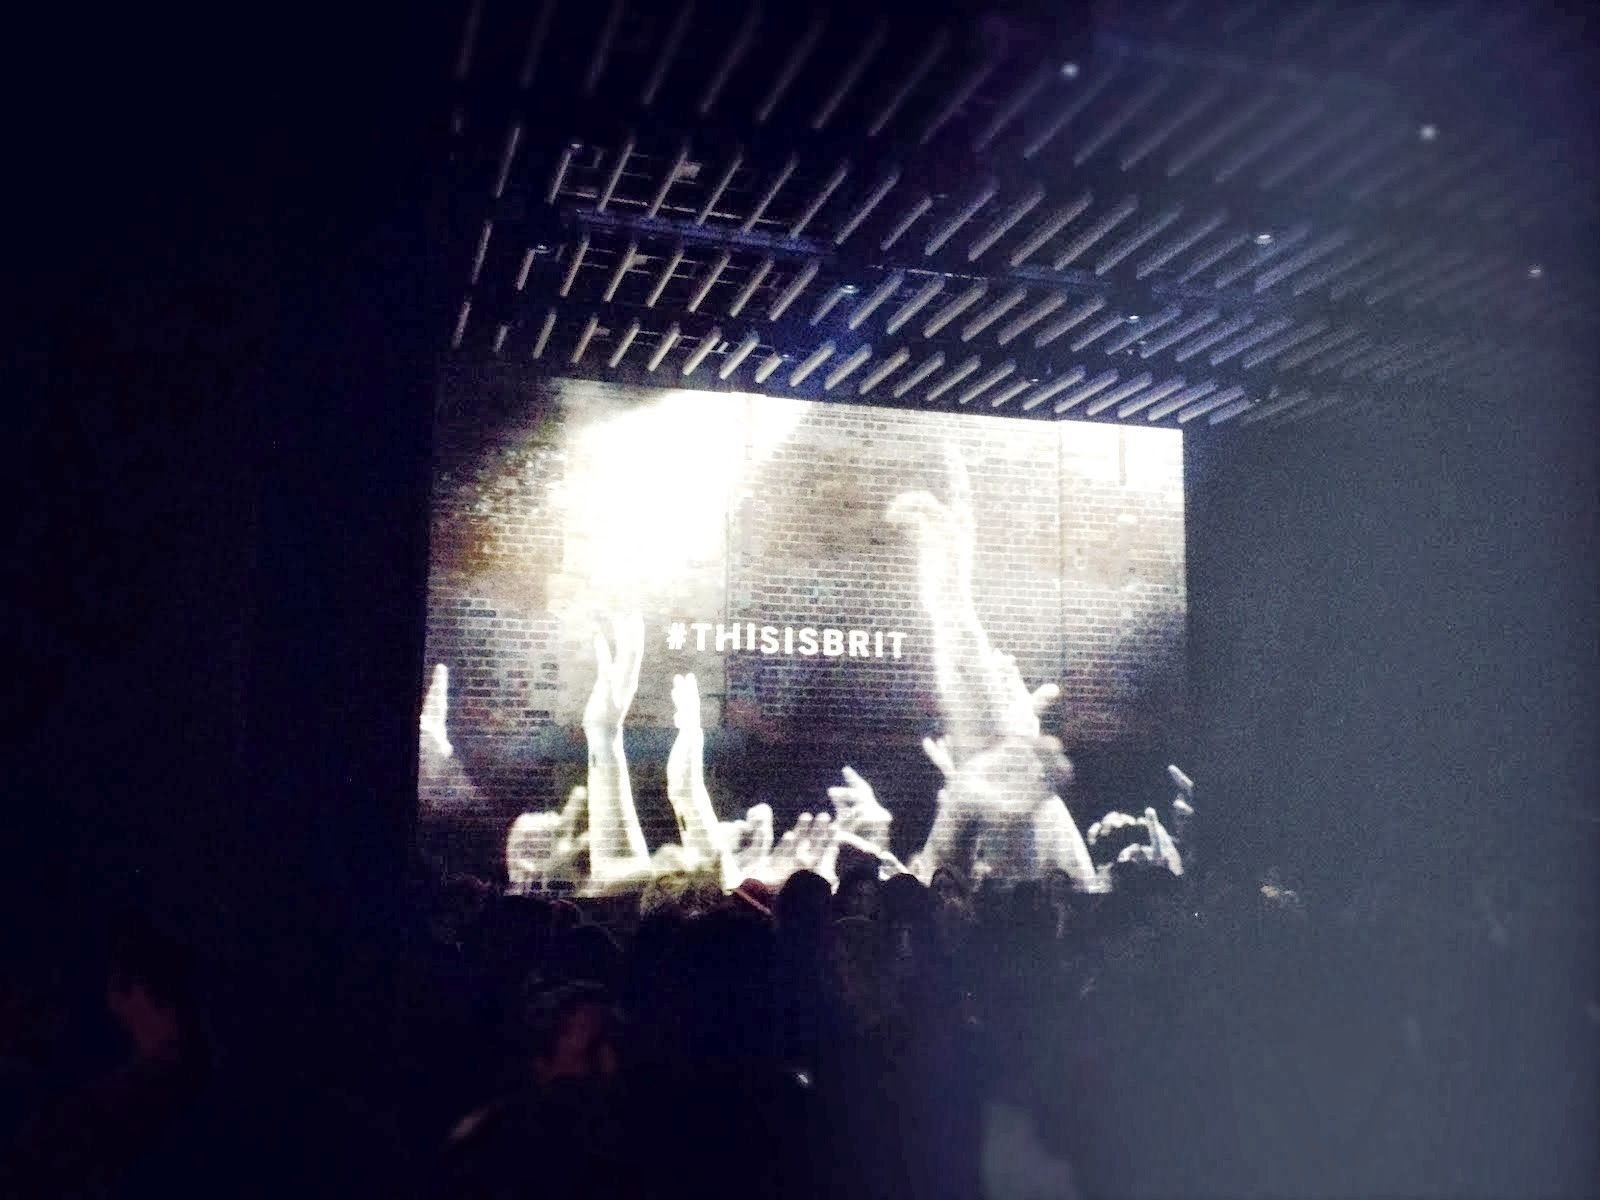 00O00 Menswear Blog: George Barnett in Burberry - Burberry Brit Rhythm, Village Underground London #ThisIsBrit October 2013